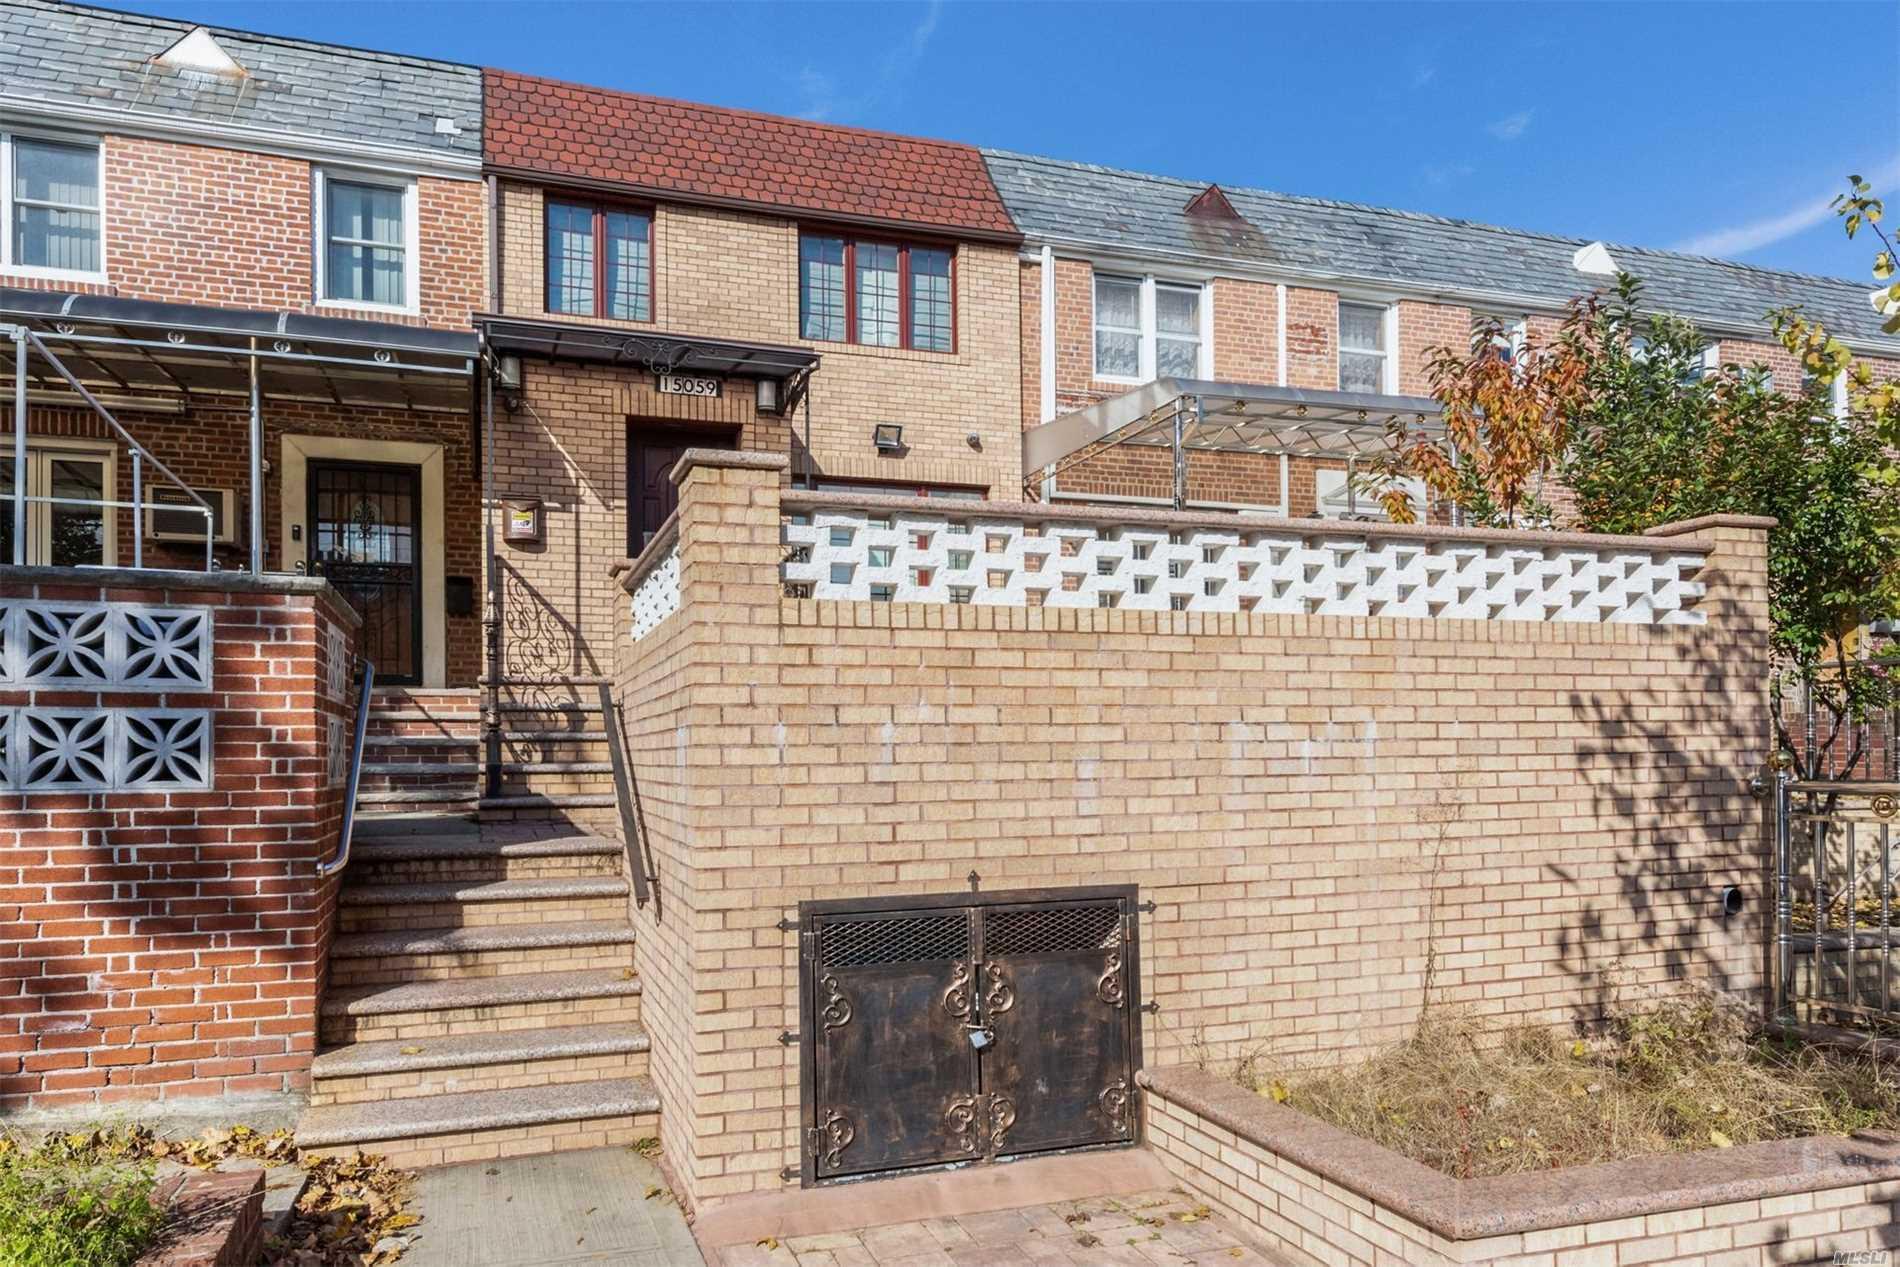 150-59 77th Rd Kew Garden Hills, NY 11367